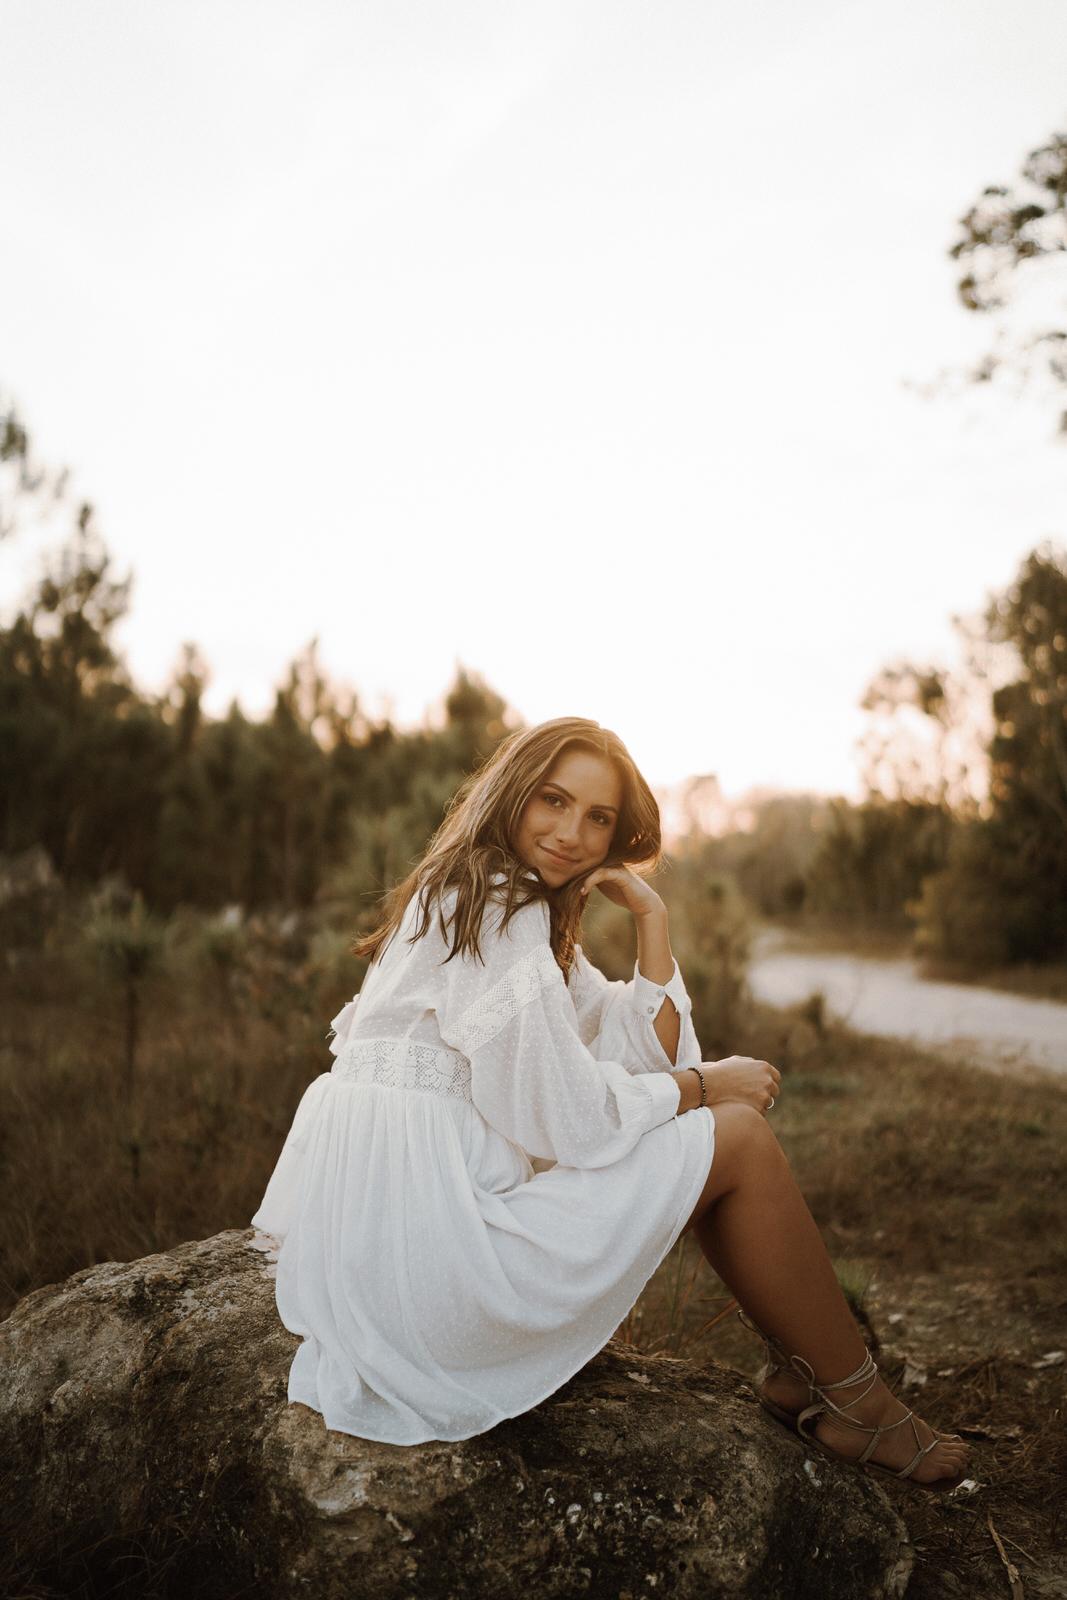 Fort Myers Senior Photos- Michelle Gonzalez Photography- Kate McQuagge-165.JPG